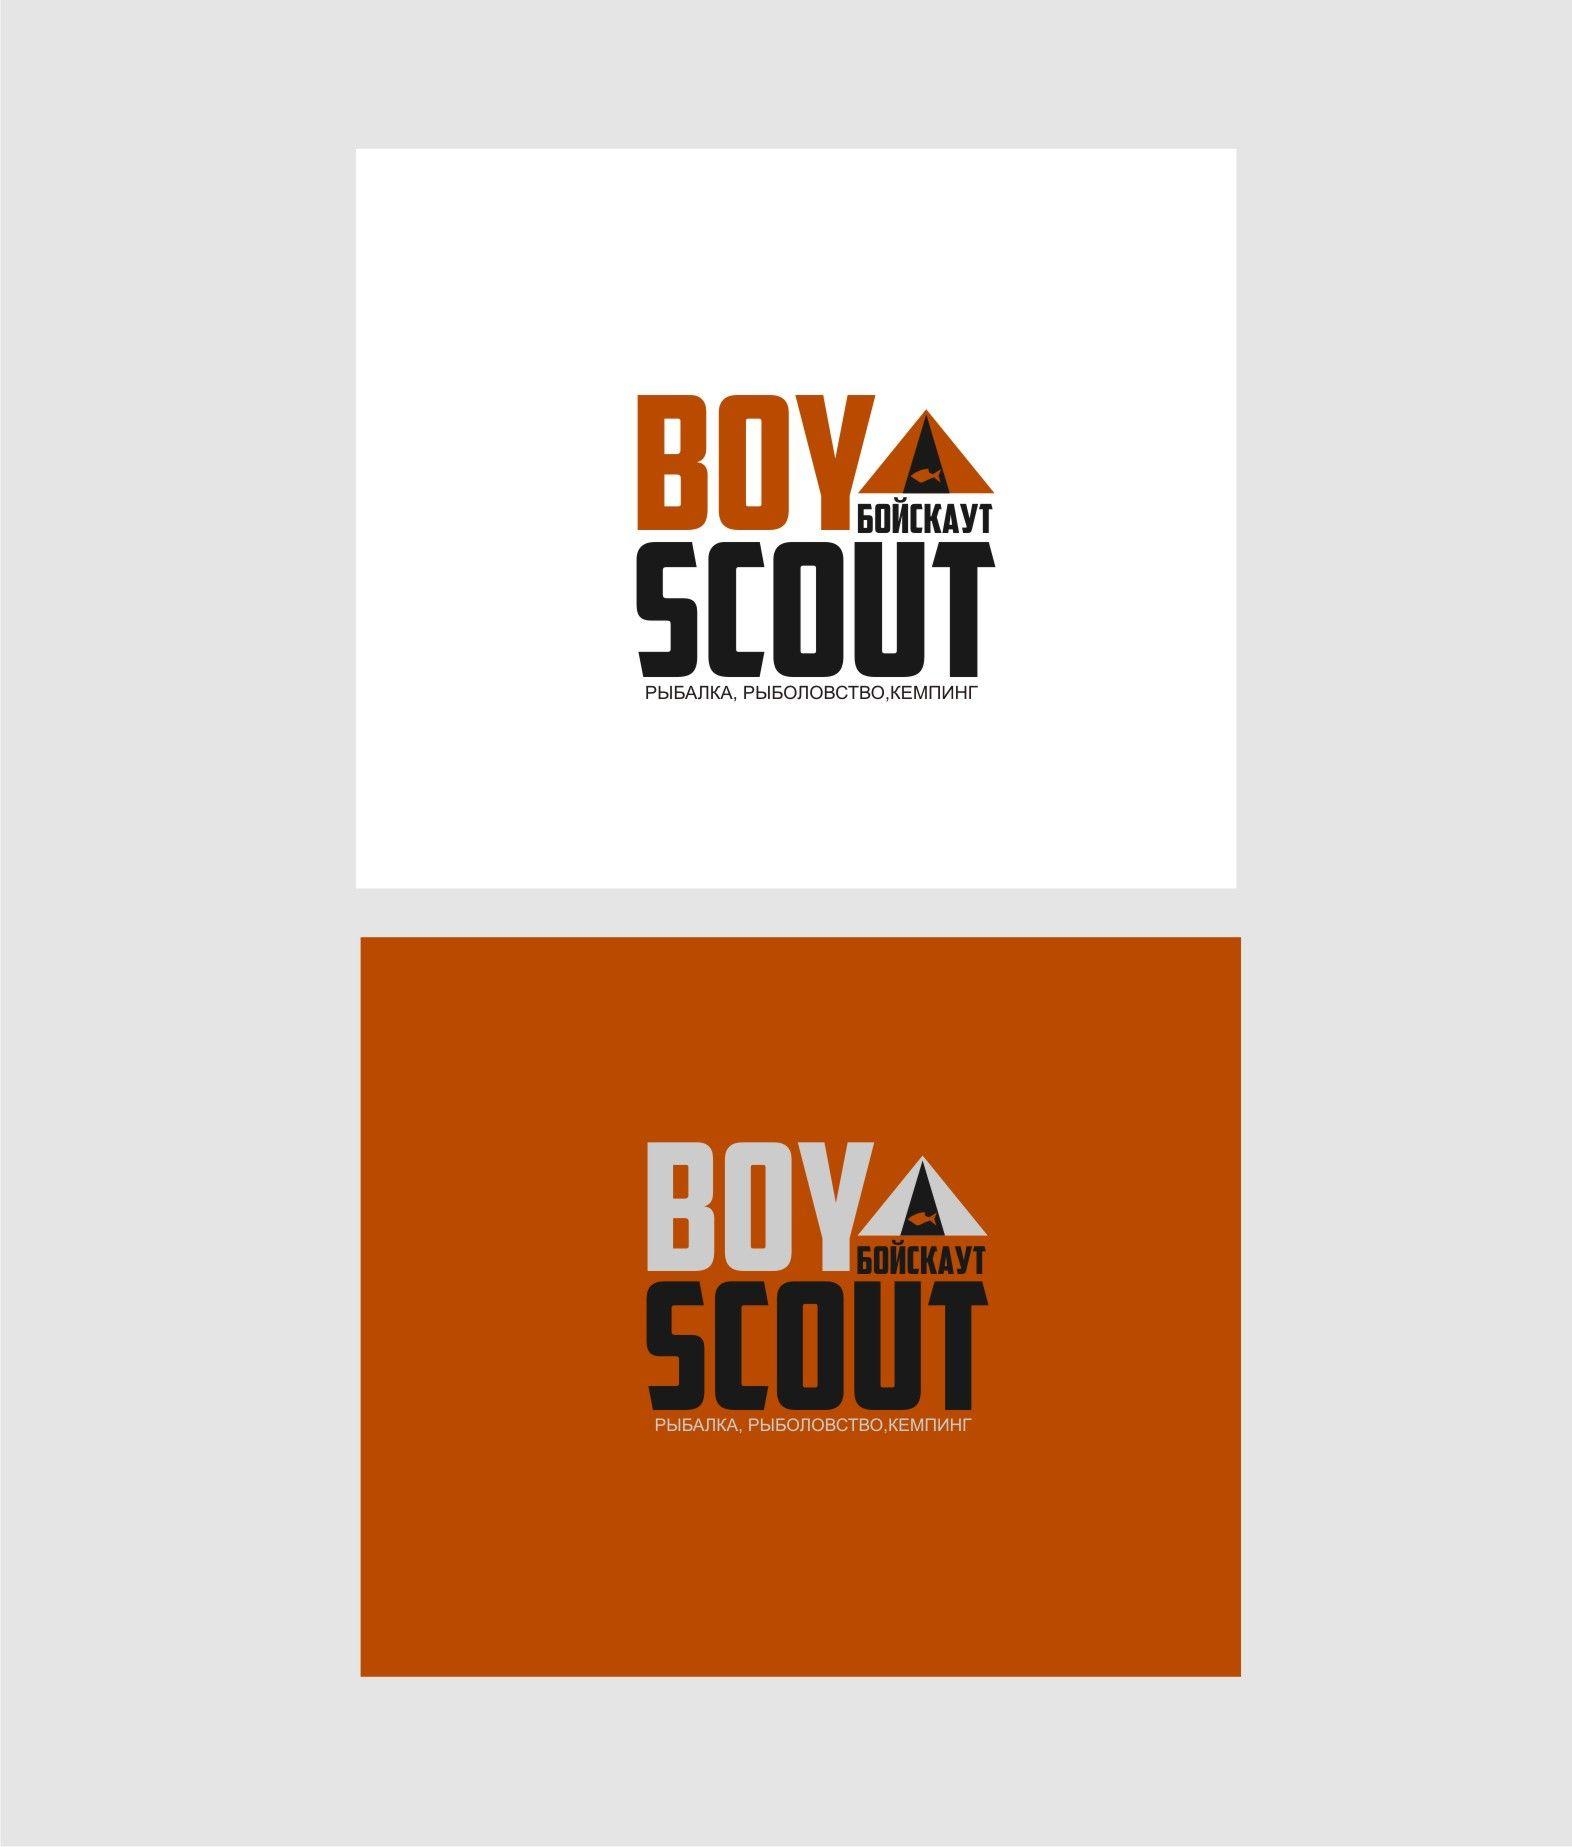 Логотип для сайта интернет-магазина BOY SCOUT - дизайнер dbyjuhfl